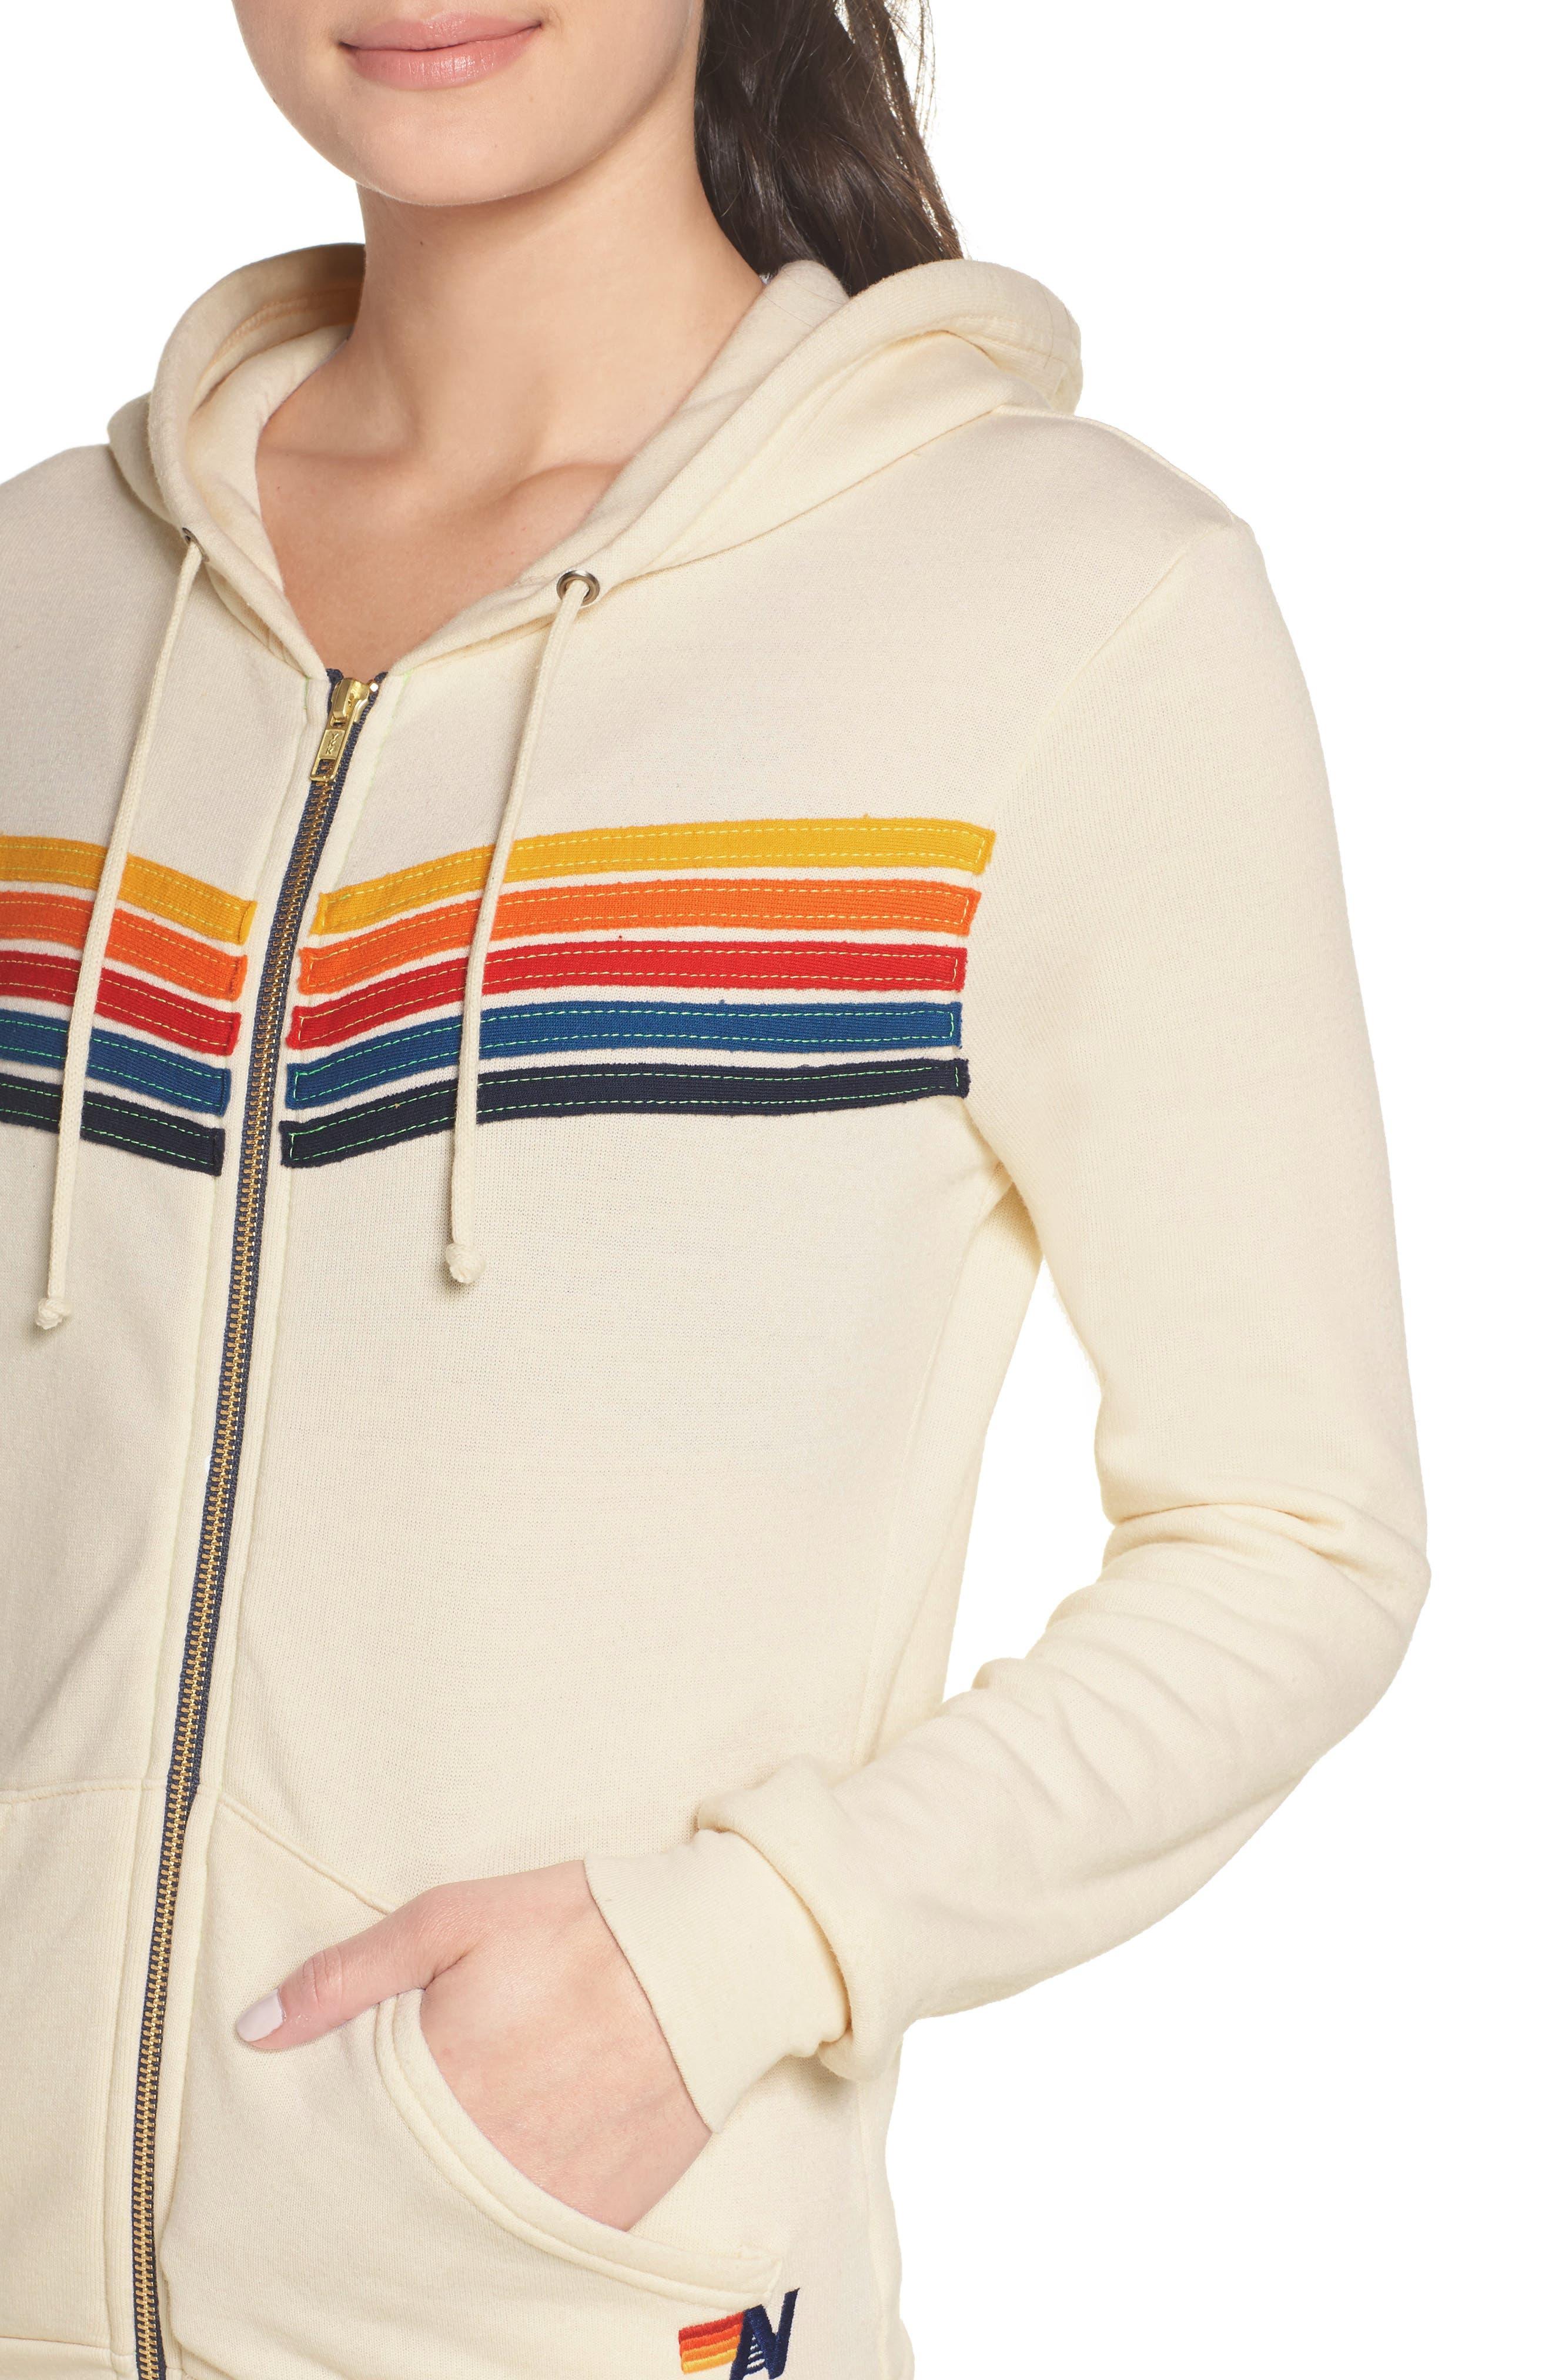 AVIATOR NATION,                             5-Stripe Zip Hoodie,                             Alternate thumbnail 4, color,                             VINTAGE WHITE